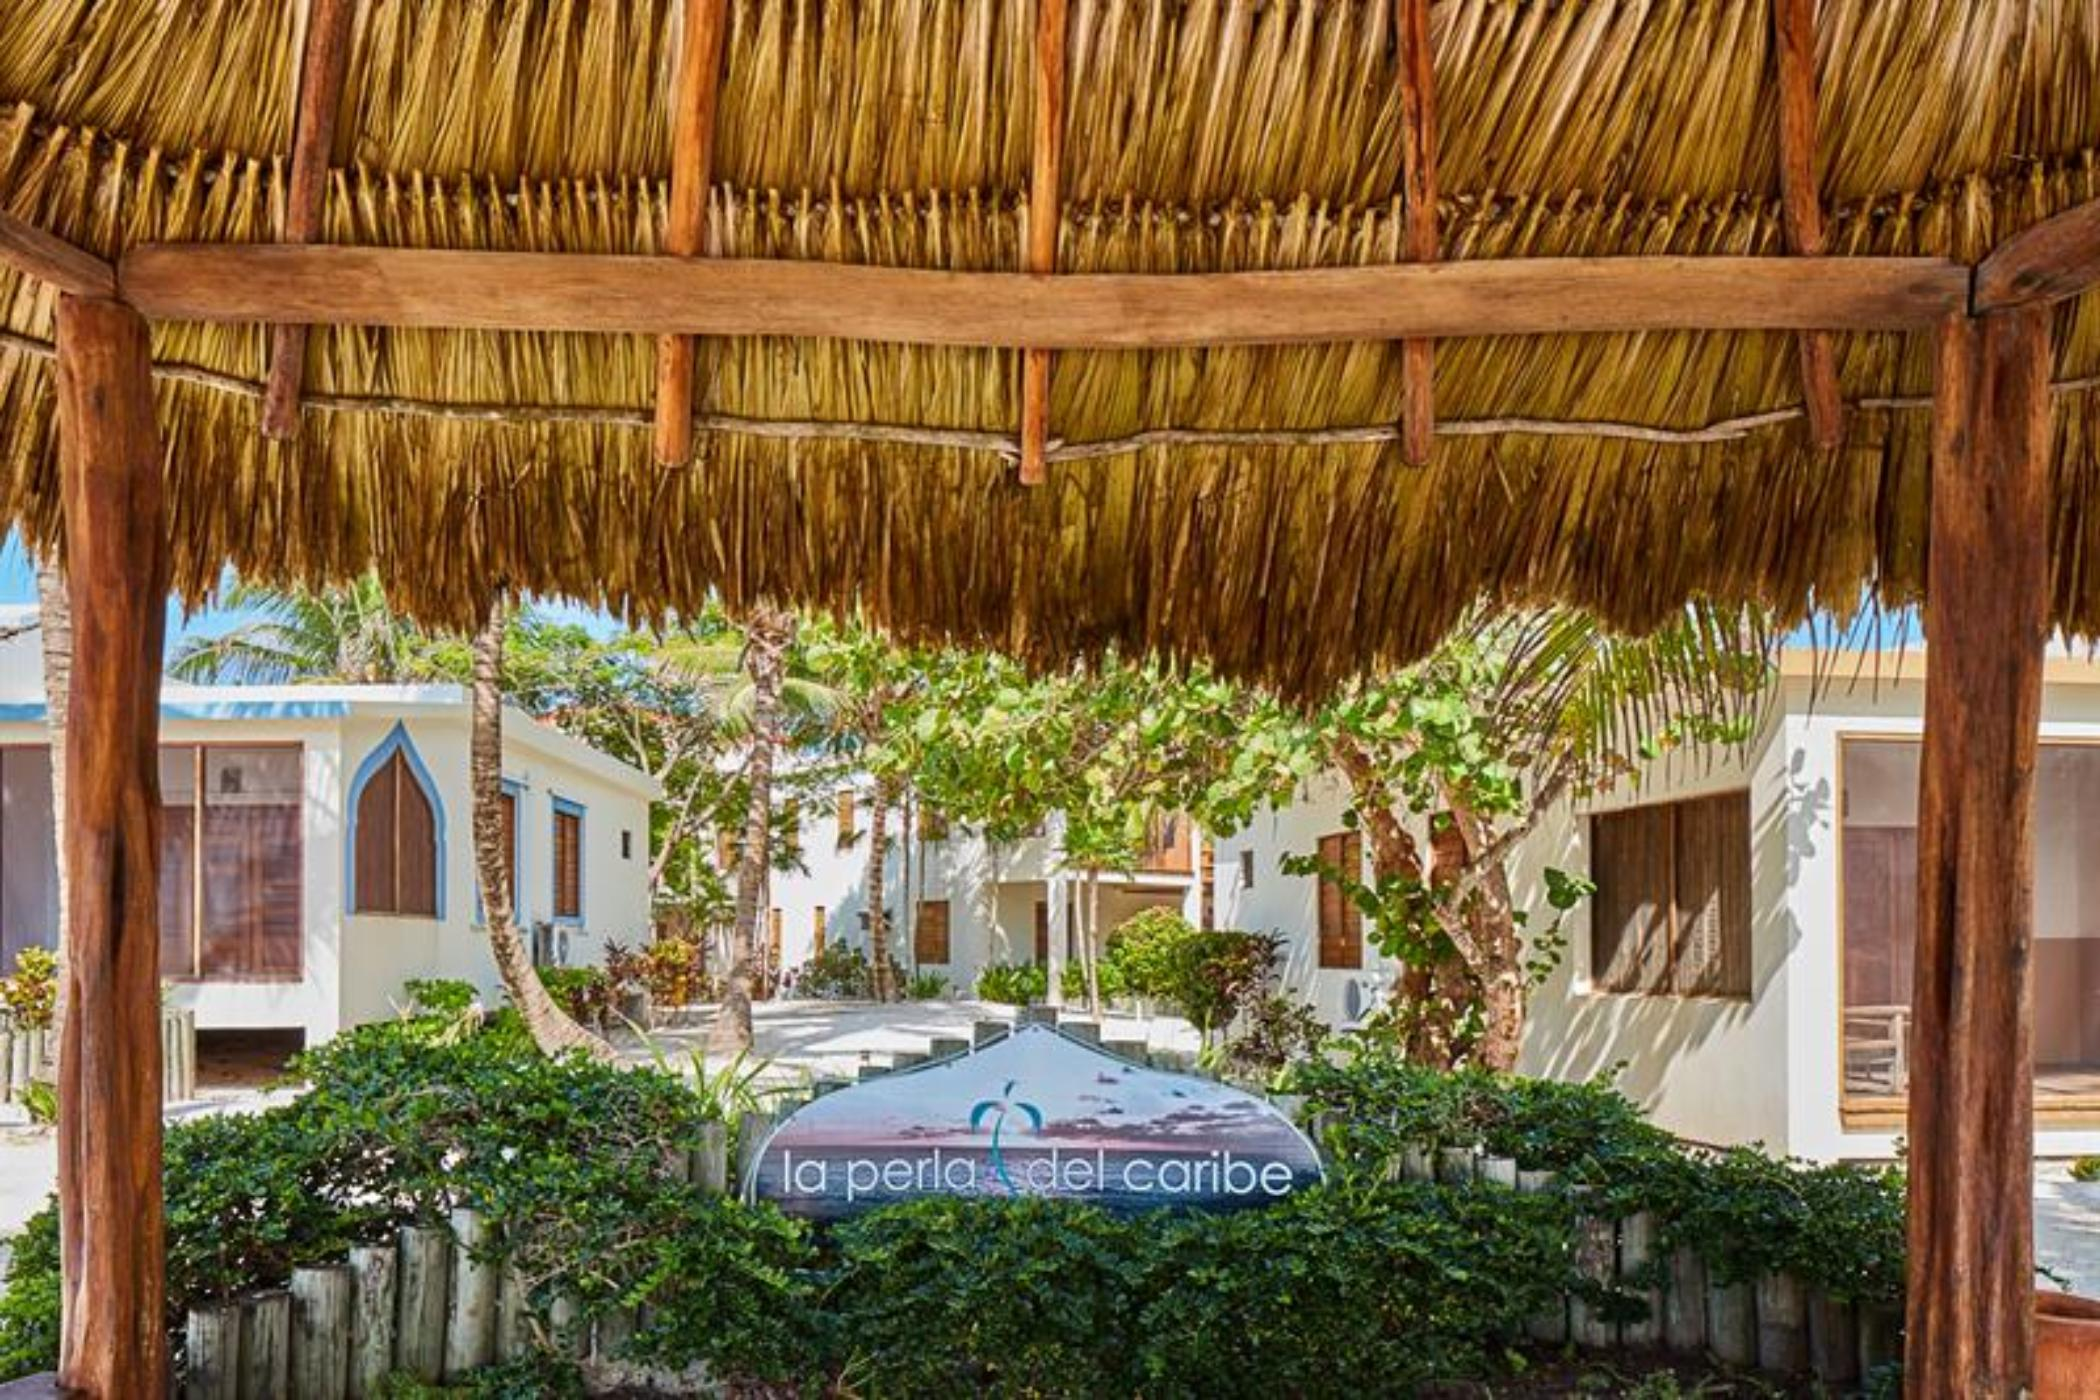 La Perla Caribe - Villa Topaz